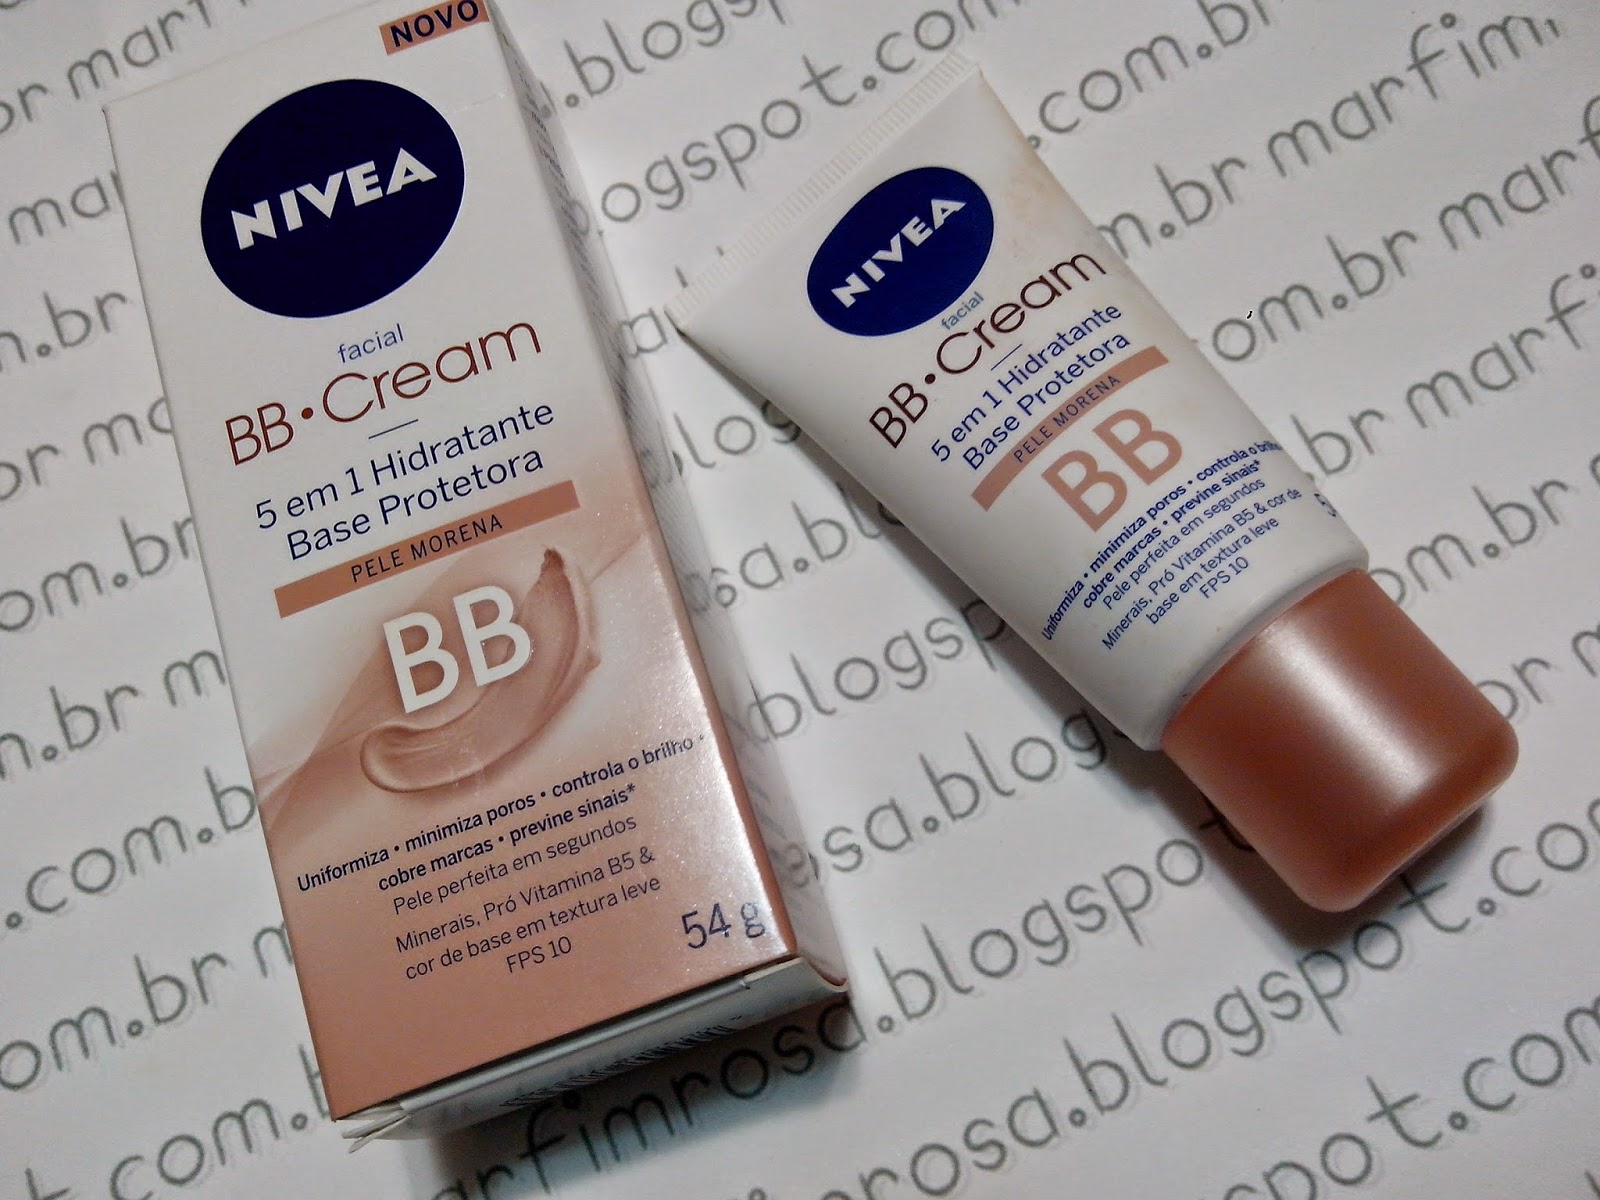 BB Cream 5 em 1 - Nivea resenha